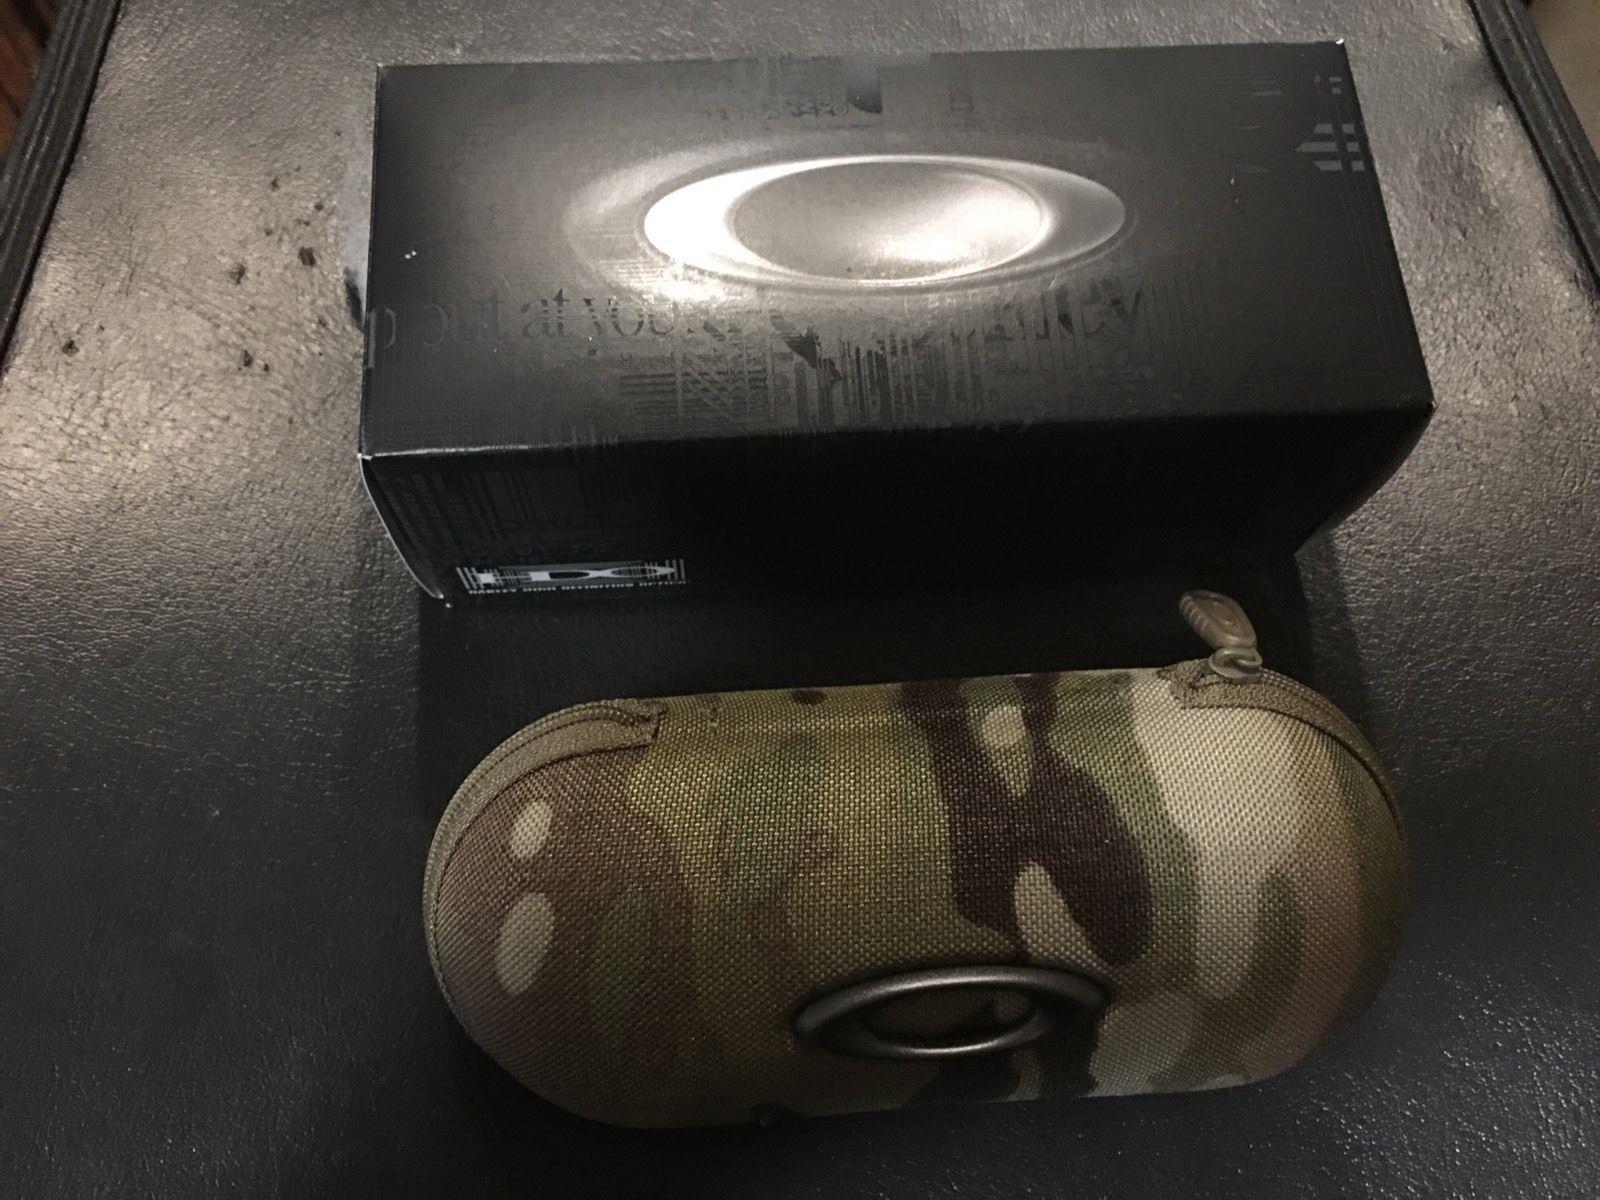 BNIB Oakley Solf Vault Multicam Cases Camo SI - s-l1600.jpg